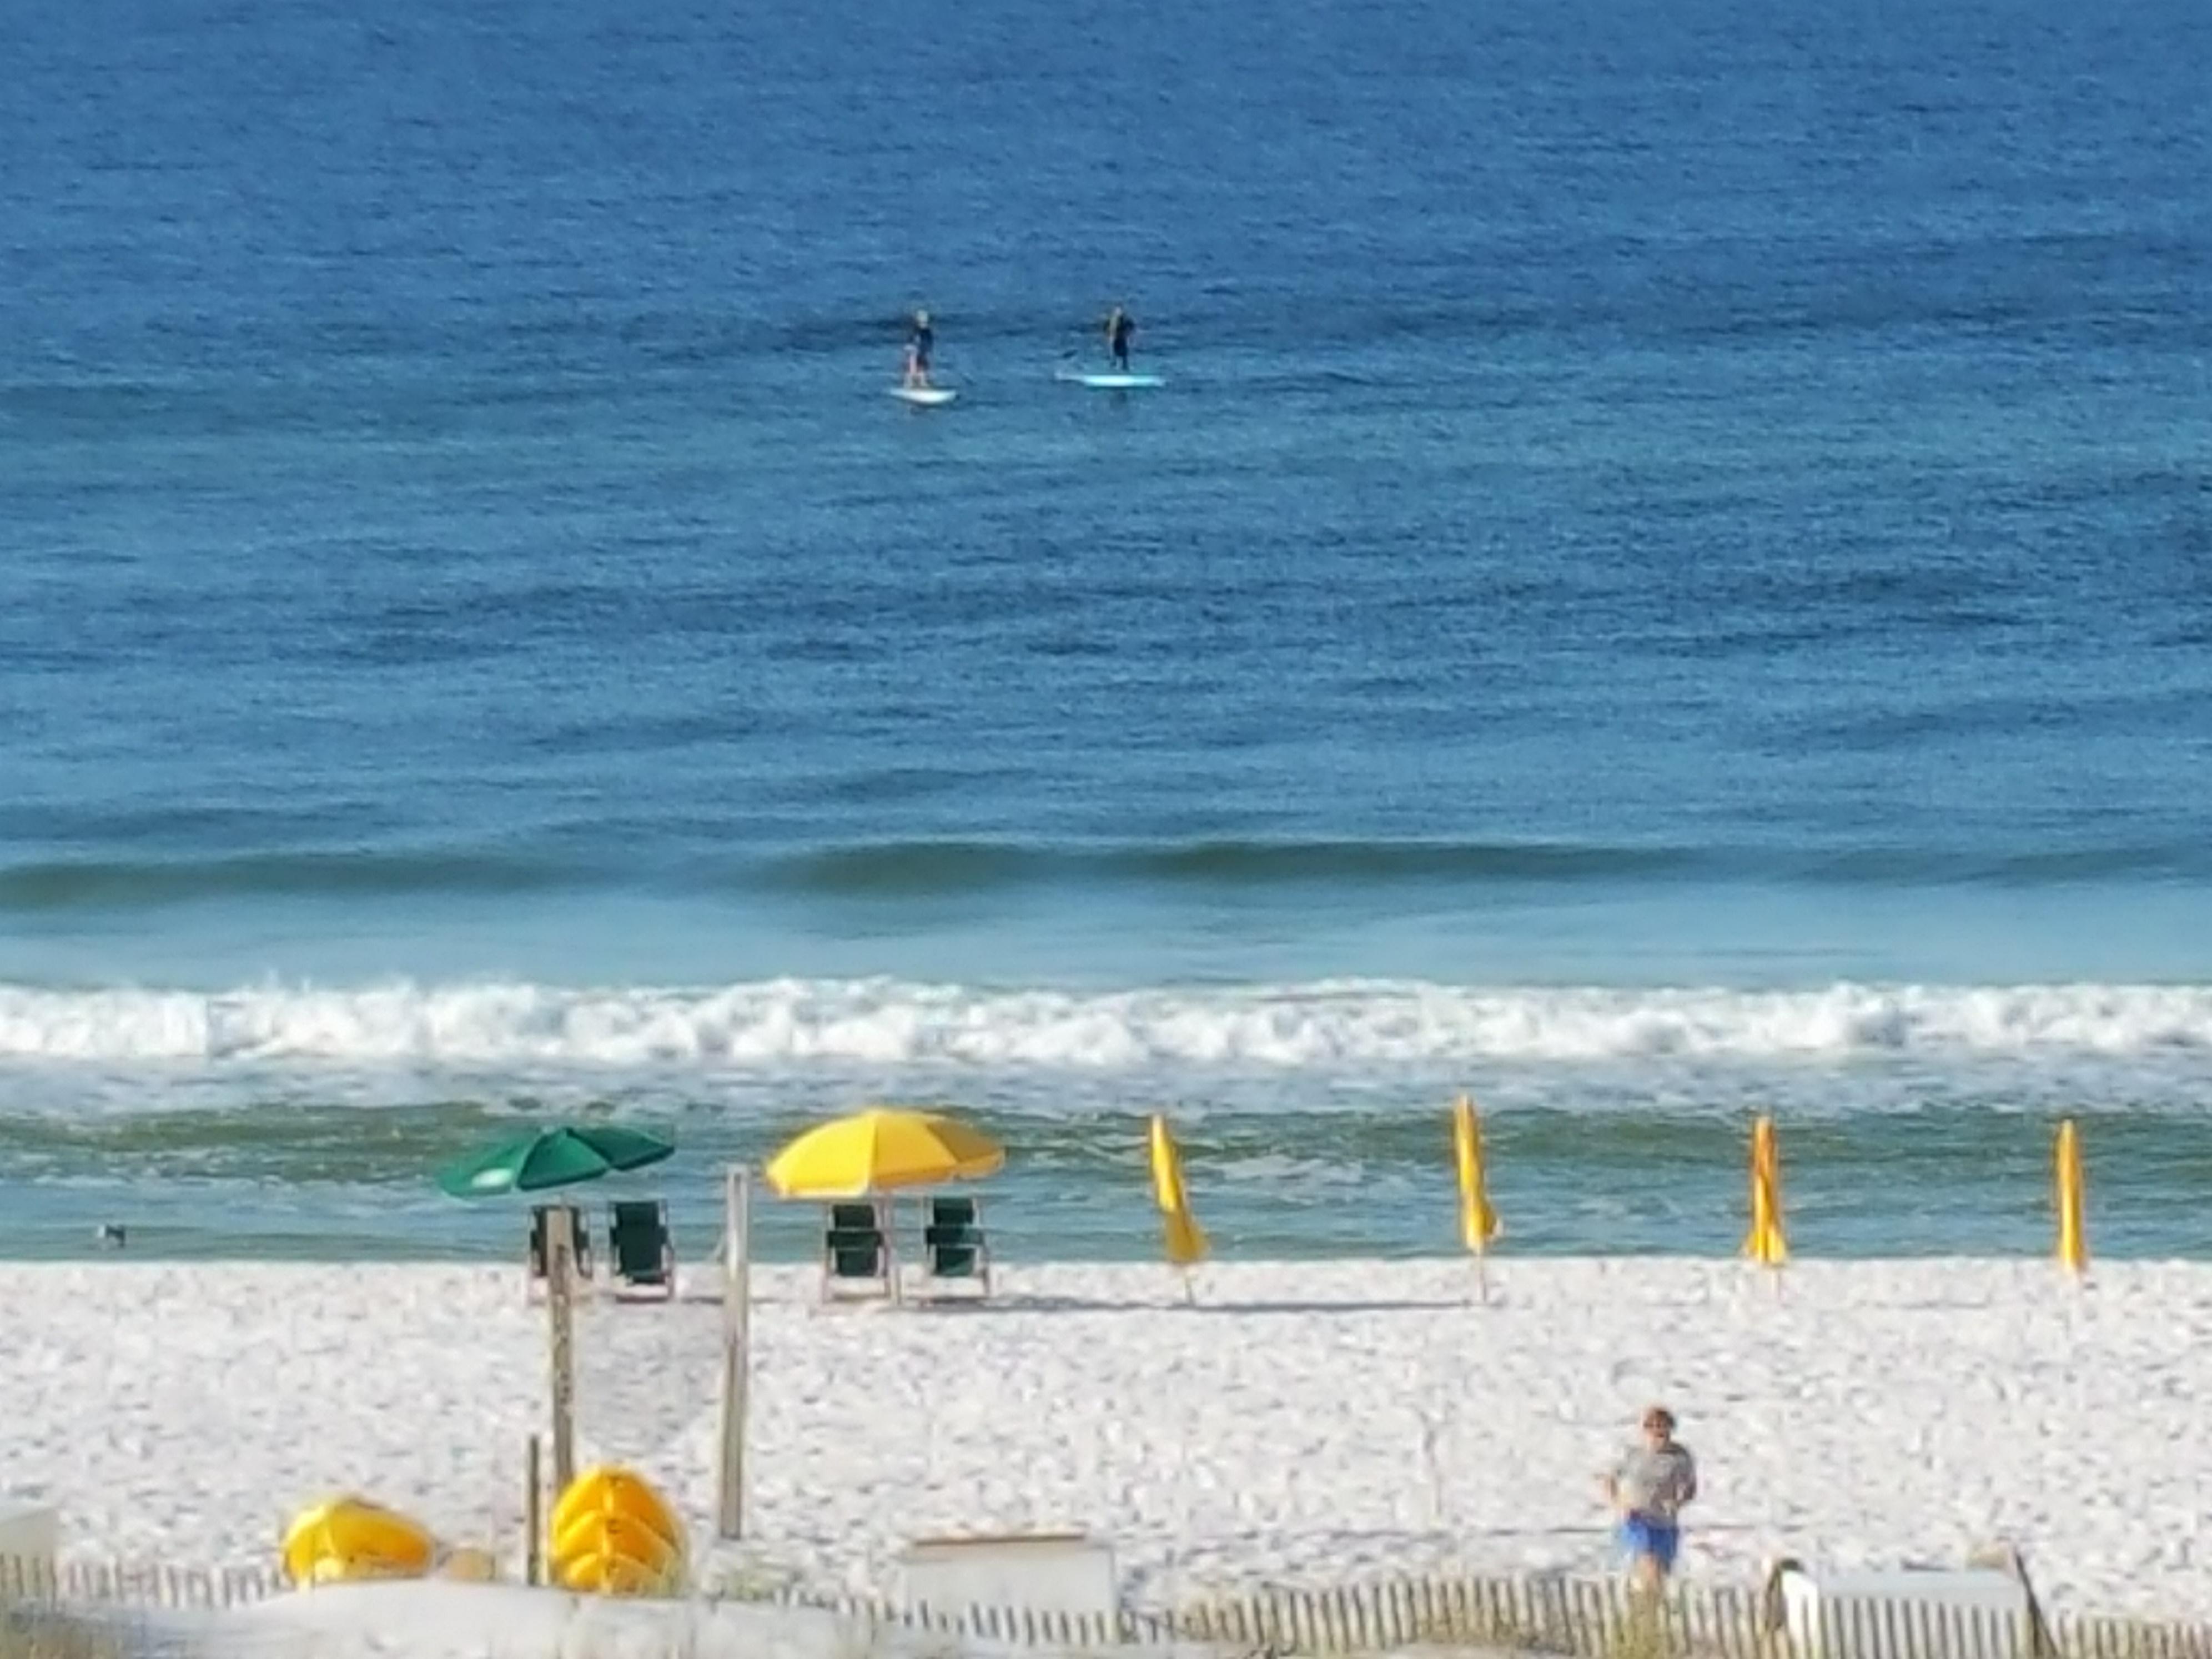 Standup Paddleboarders At Miramar Beach Seen From Hilton Sandestin Room